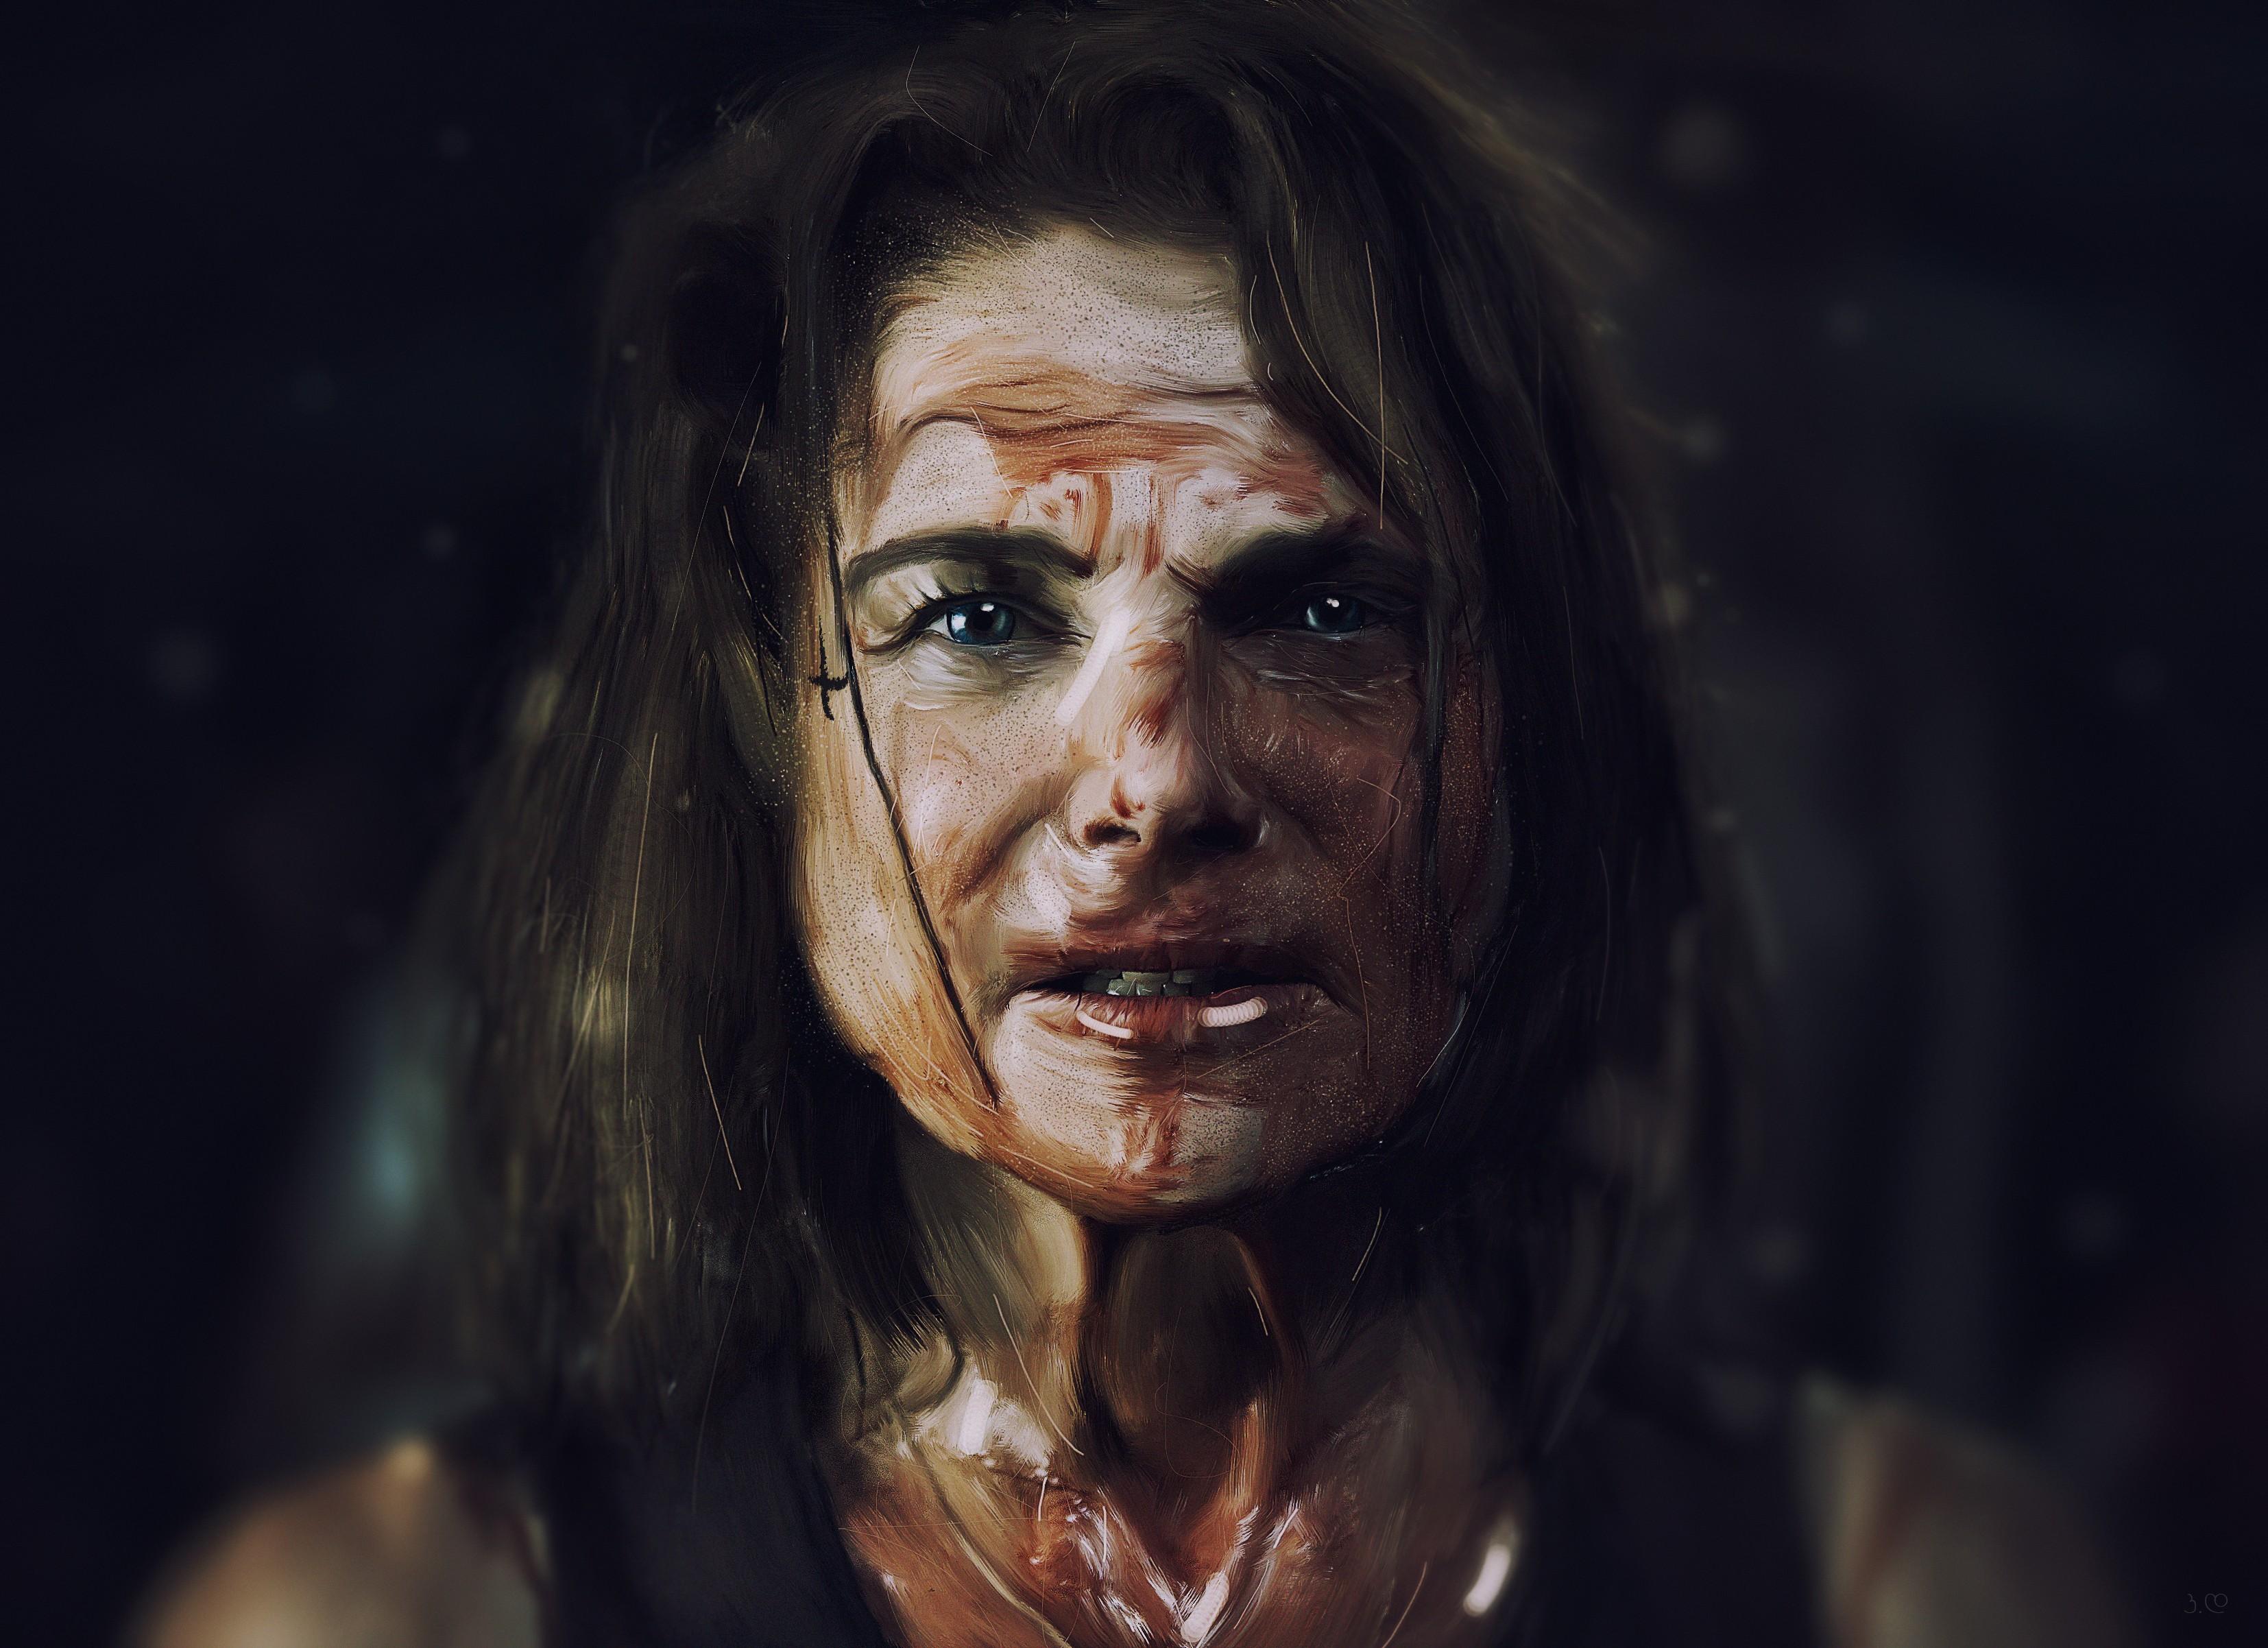 Wallpaper Face Portrait Photography Blood The Walking Dead